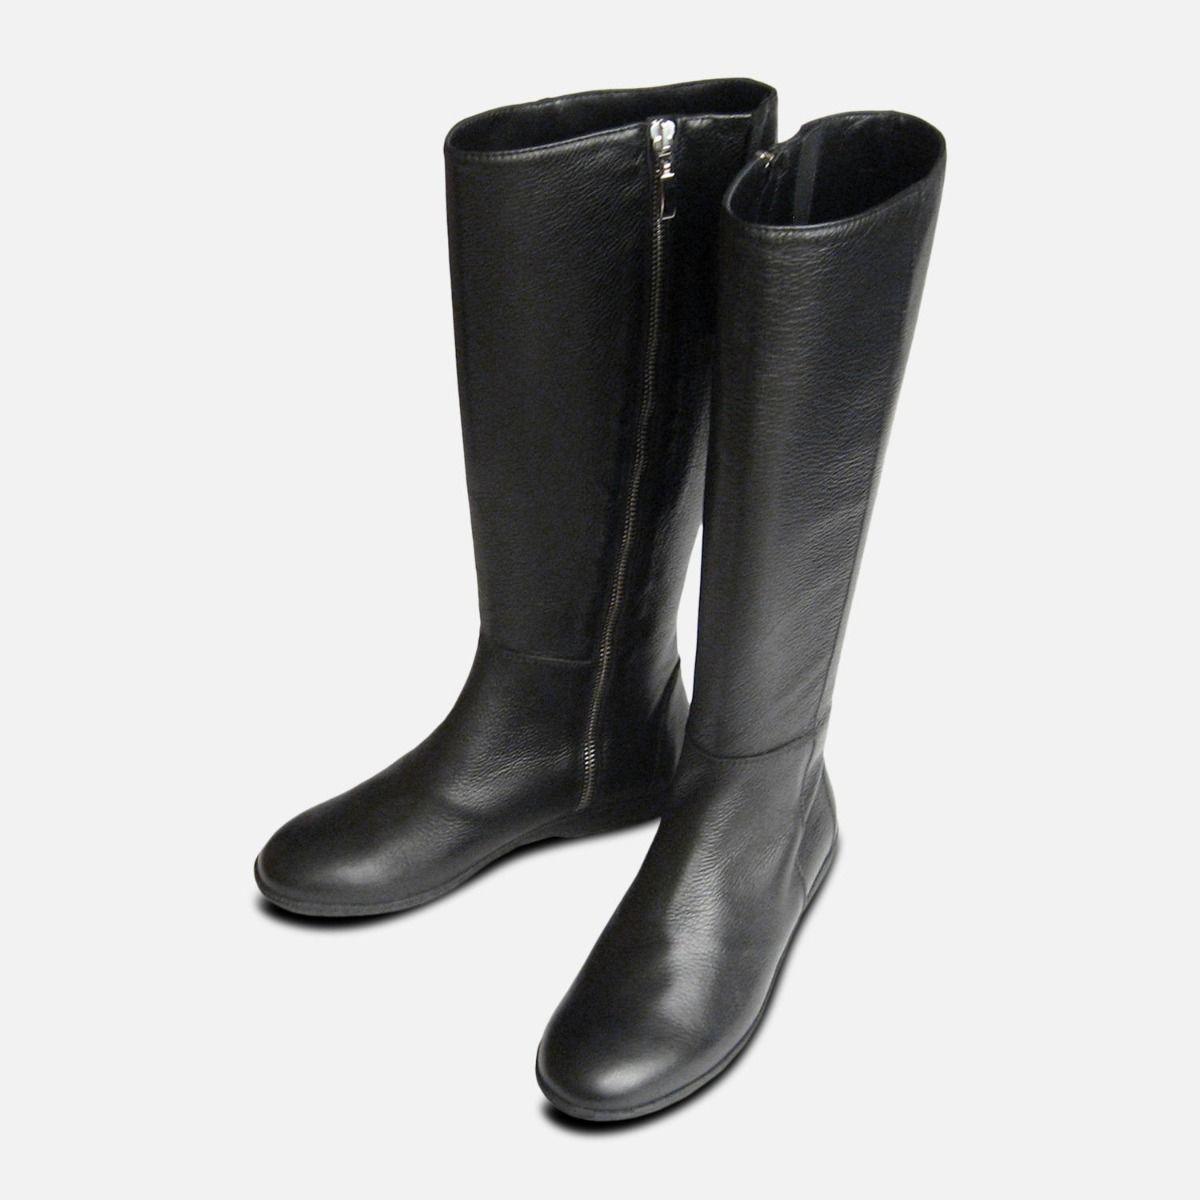 961f667e307 Luxury Italian Designer Ladies Black Riding Boots by Arthur Knight